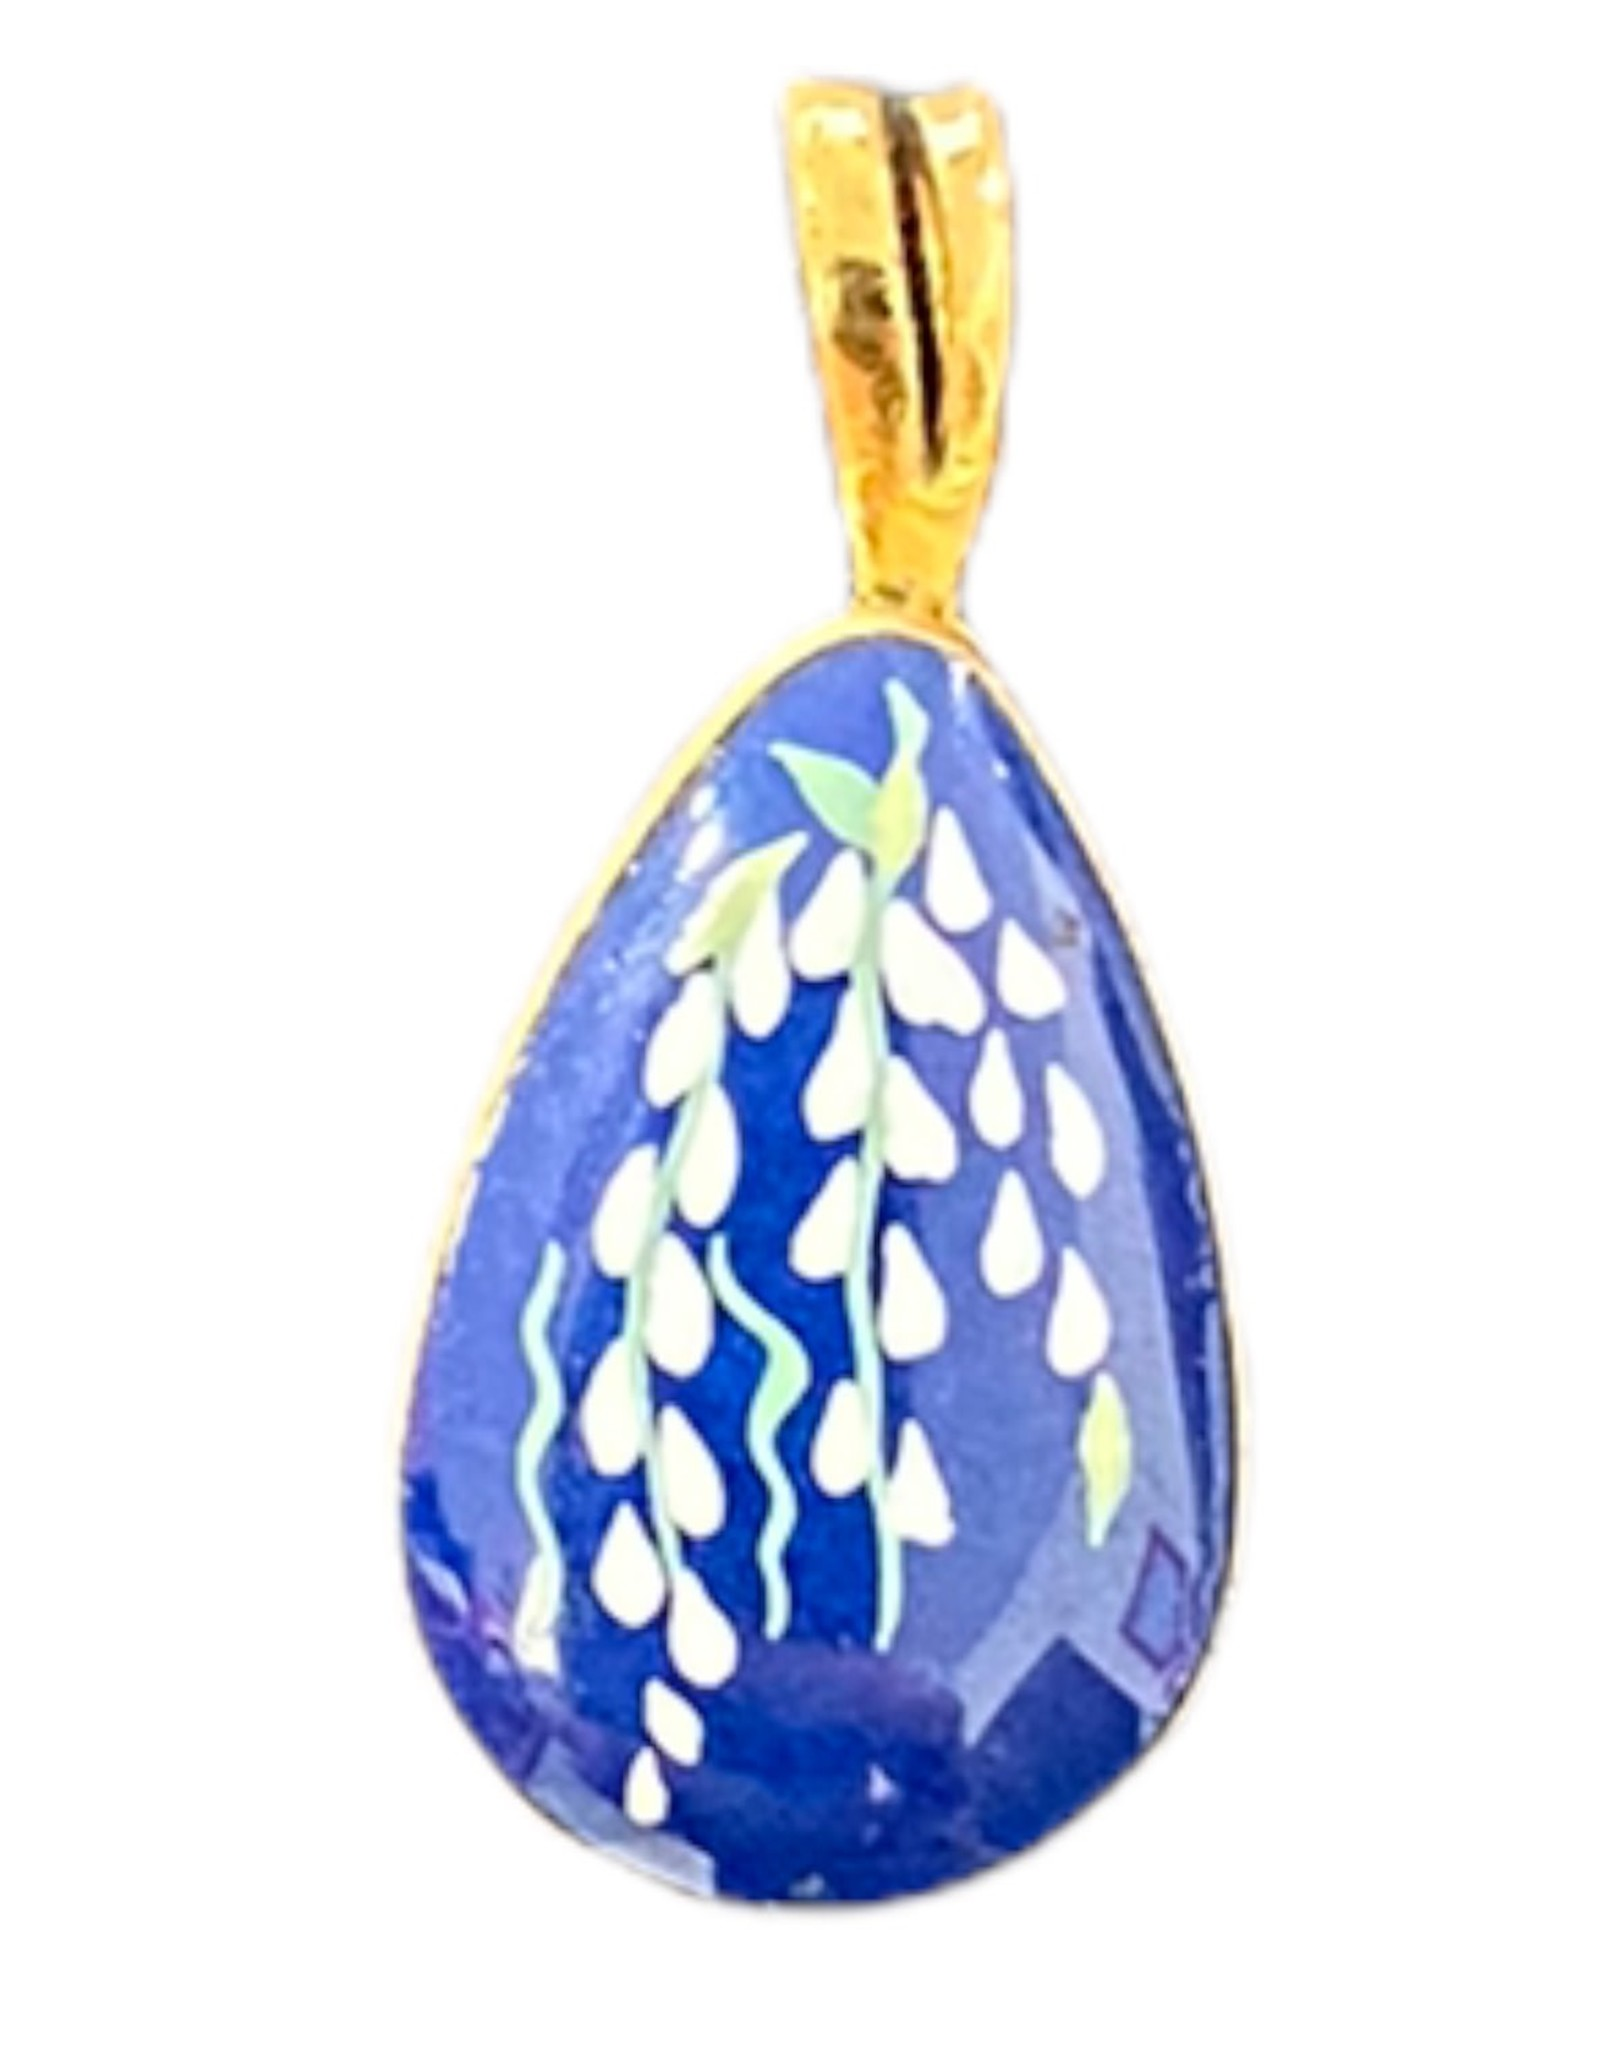 lenox blue pendant